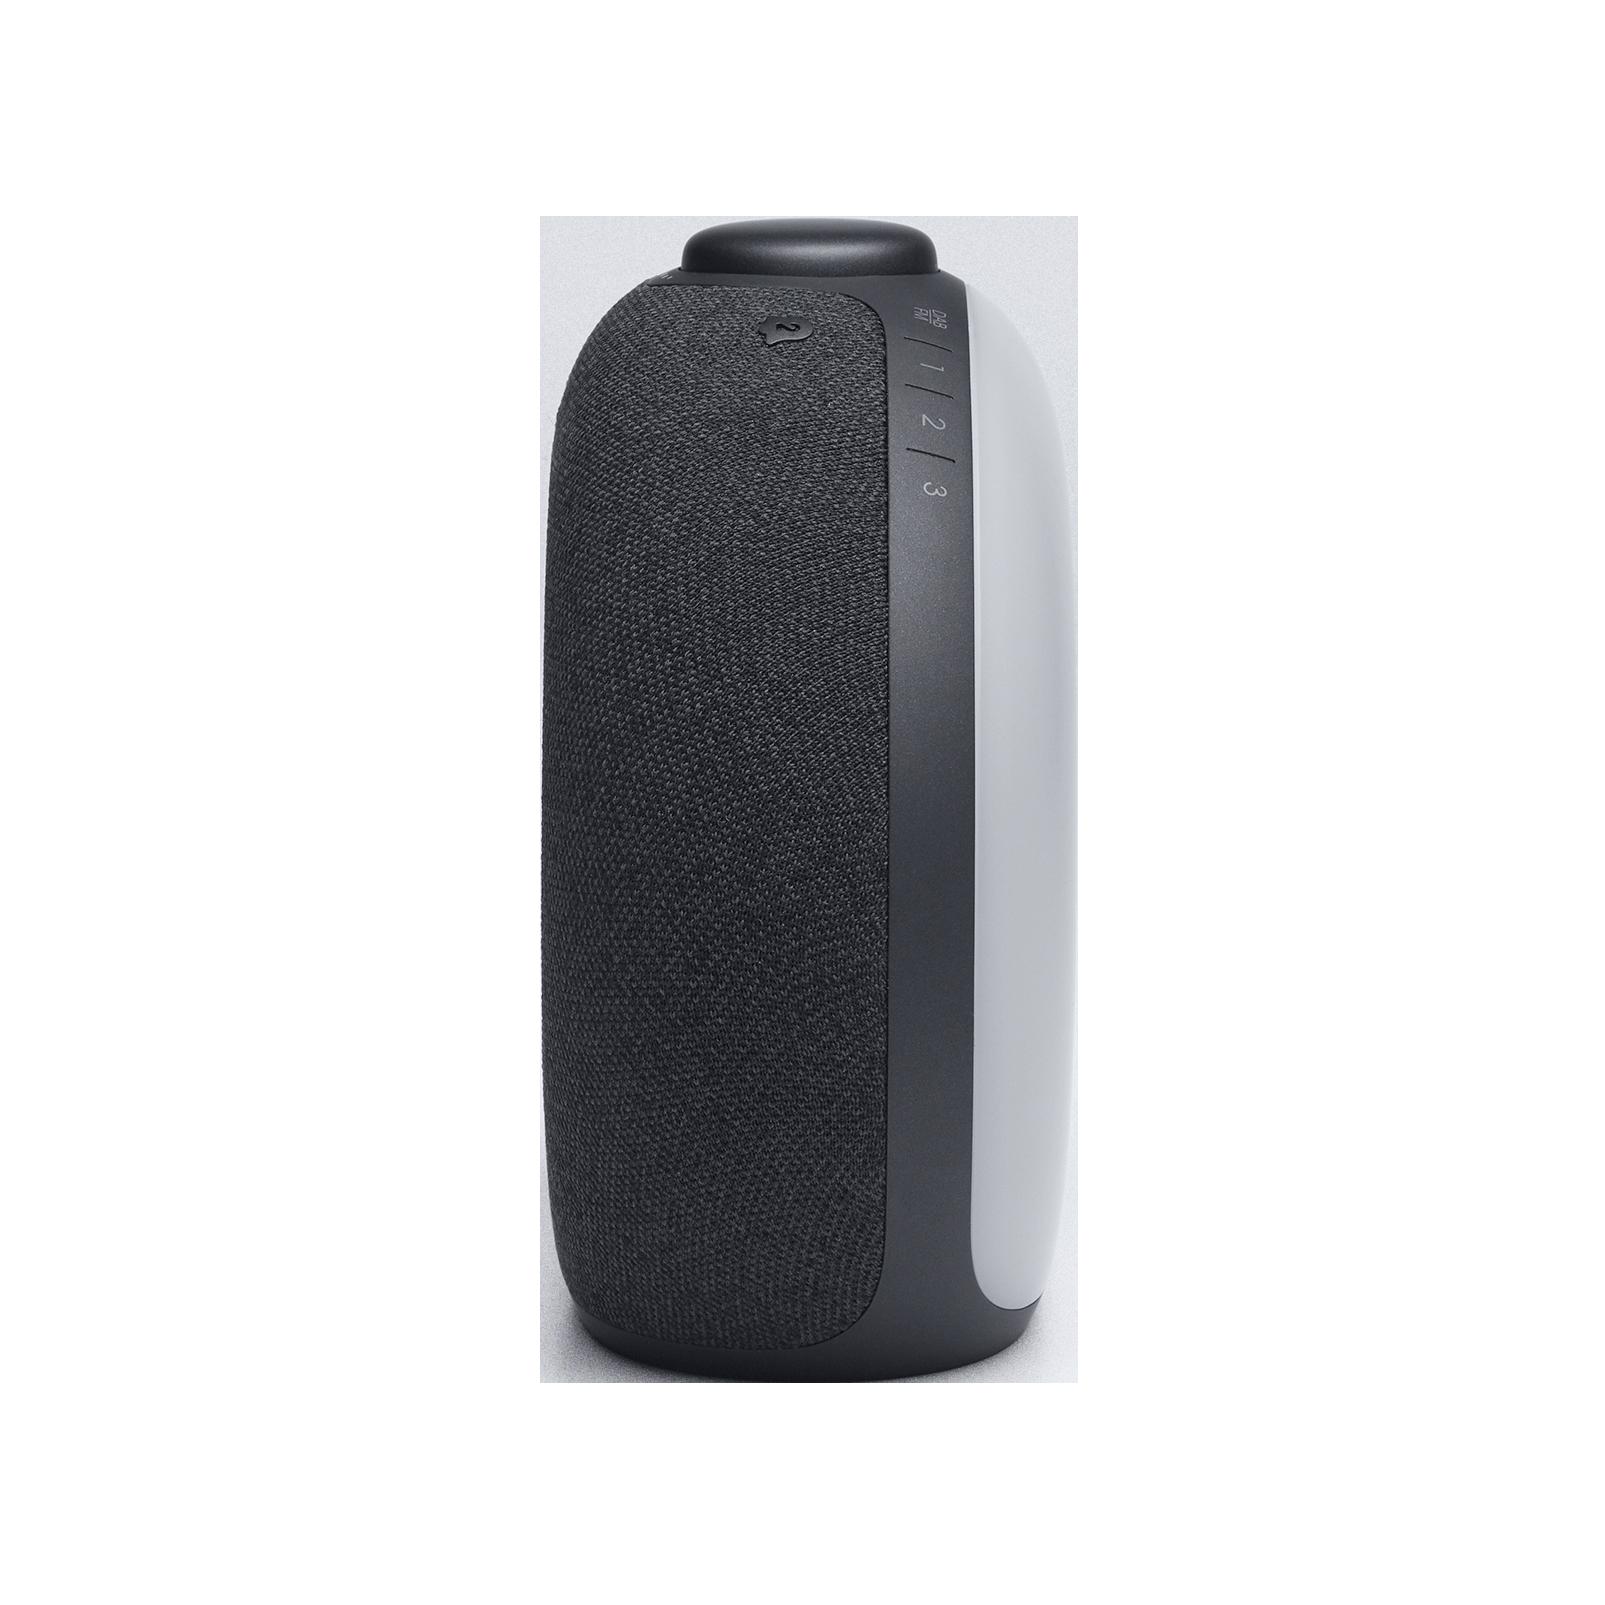 JBL Horizon 2 DAB - Black - Bluetooth clock radio speaker with DAB/DAB+/FM - Left